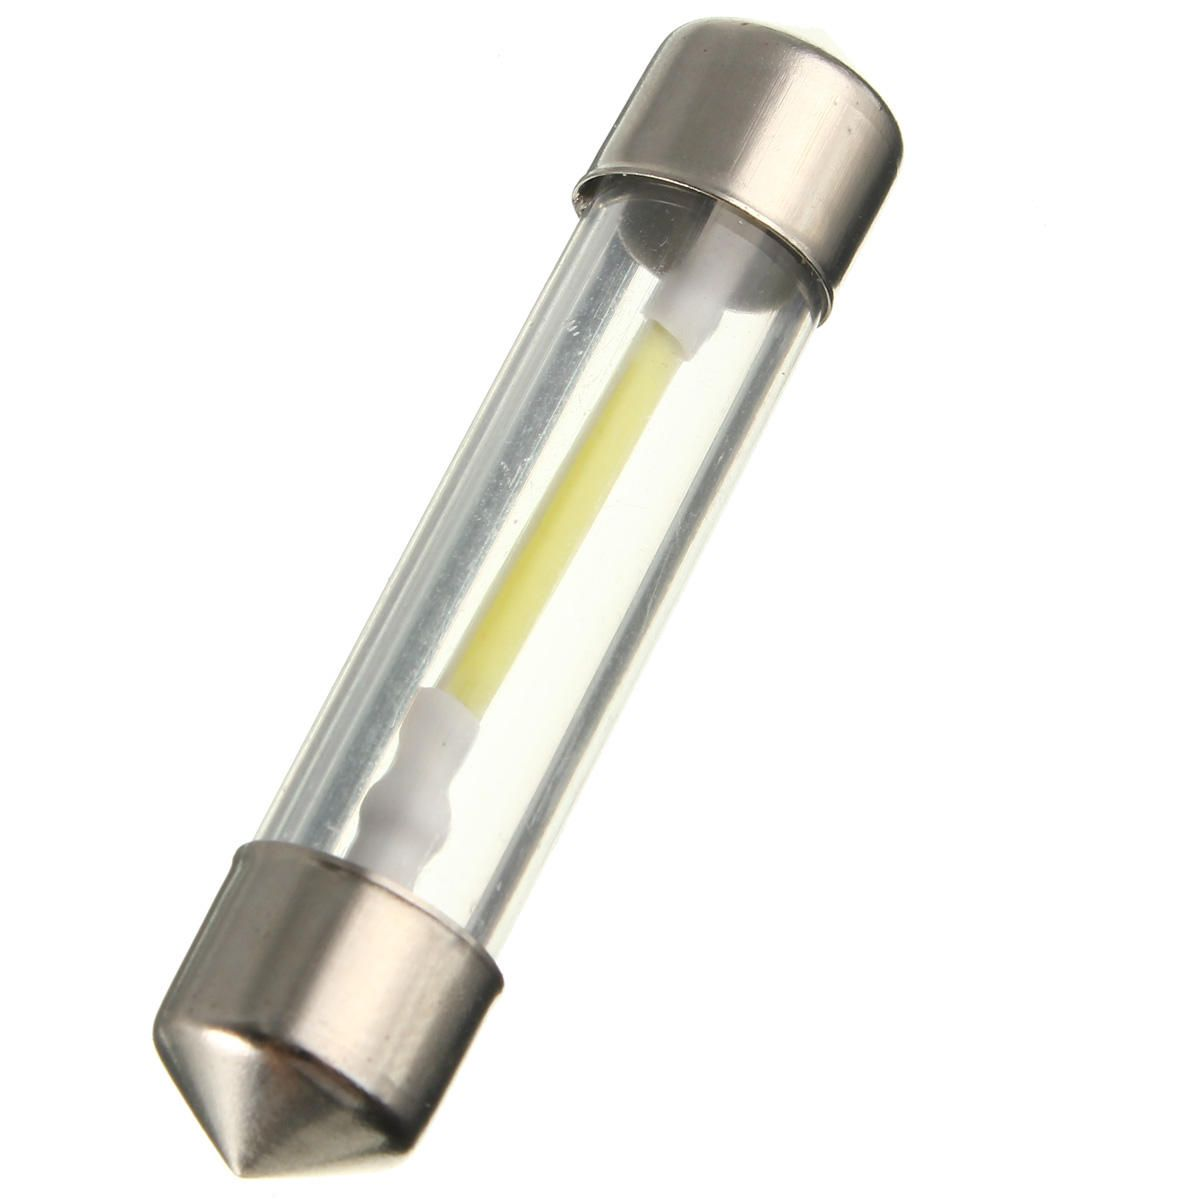 CYV US$2.00 31/36/39/41mm COB LED Festoon Dome Lights License Plate Reading Map Lamp 12V White